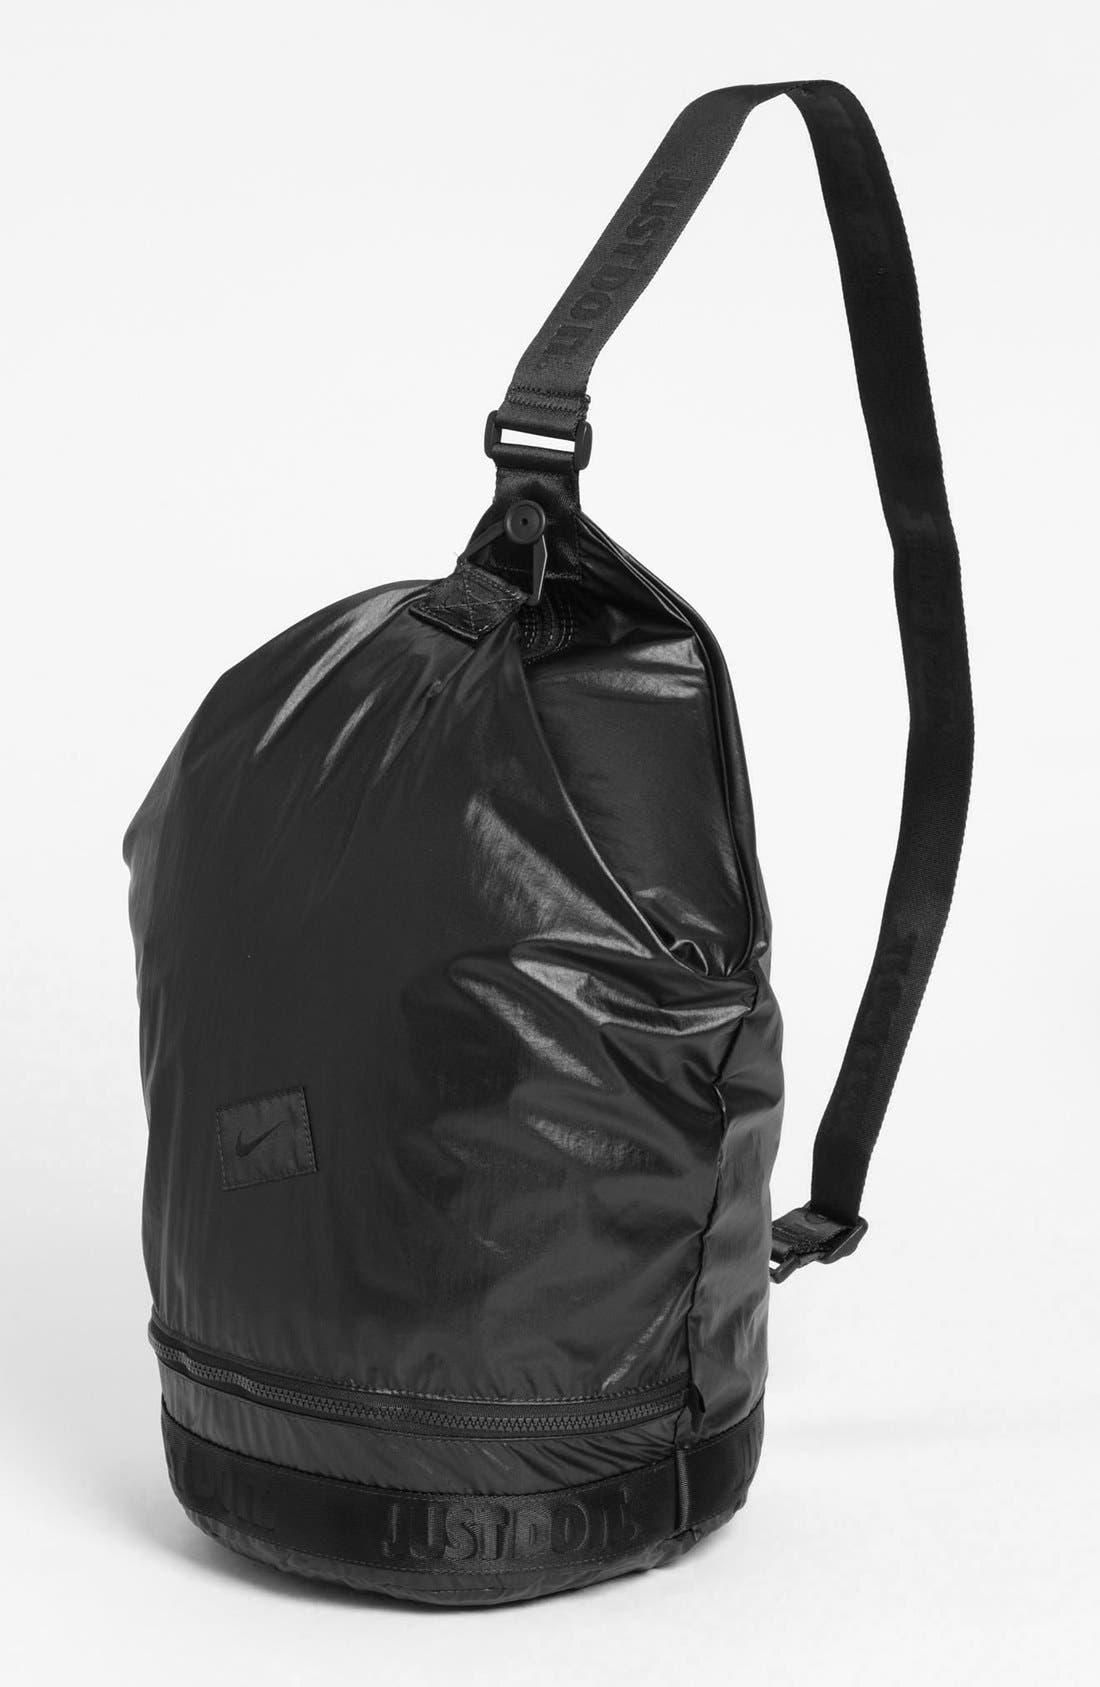 NIKE,                             'Bucket' Sling Bag,                             Alternate thumbnail 3, color,                             030